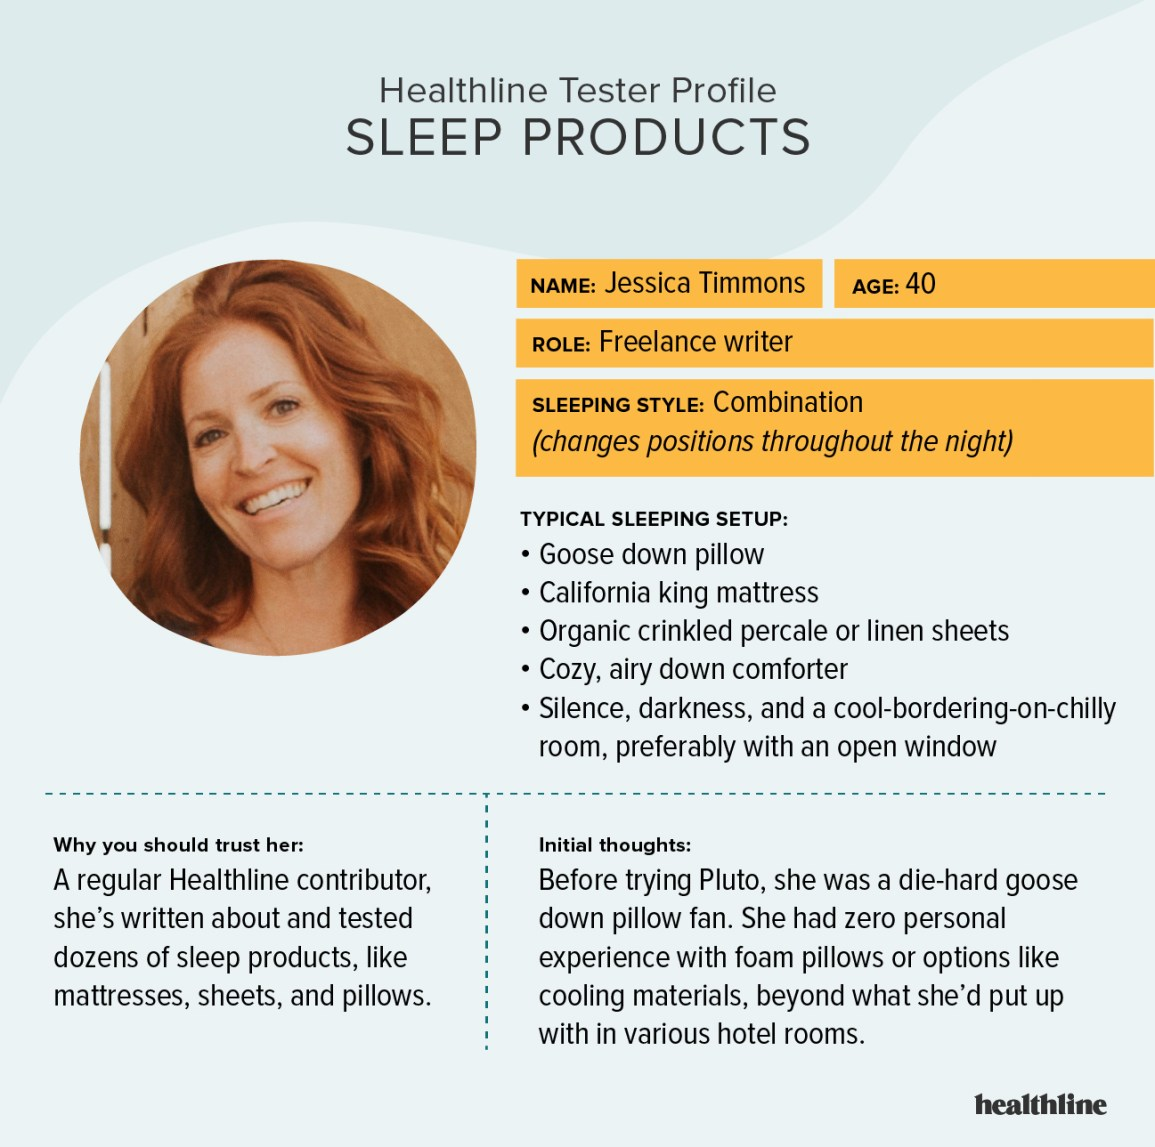 Jessica Timmons tester profile